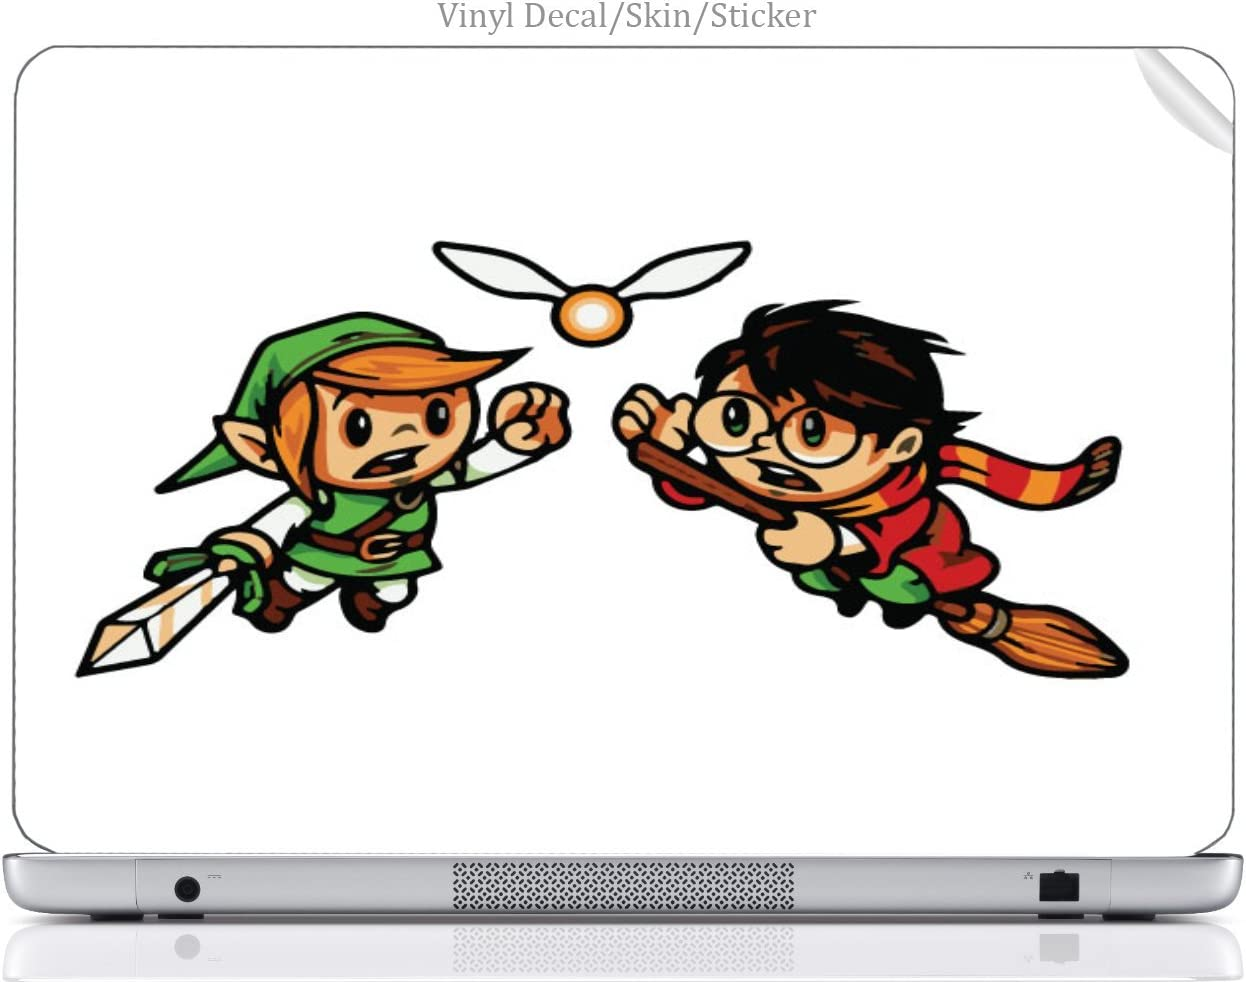 Laptop VINYL DECAL Sticker Skin Print Cute Harry and Link Art fits ThinkPad R52